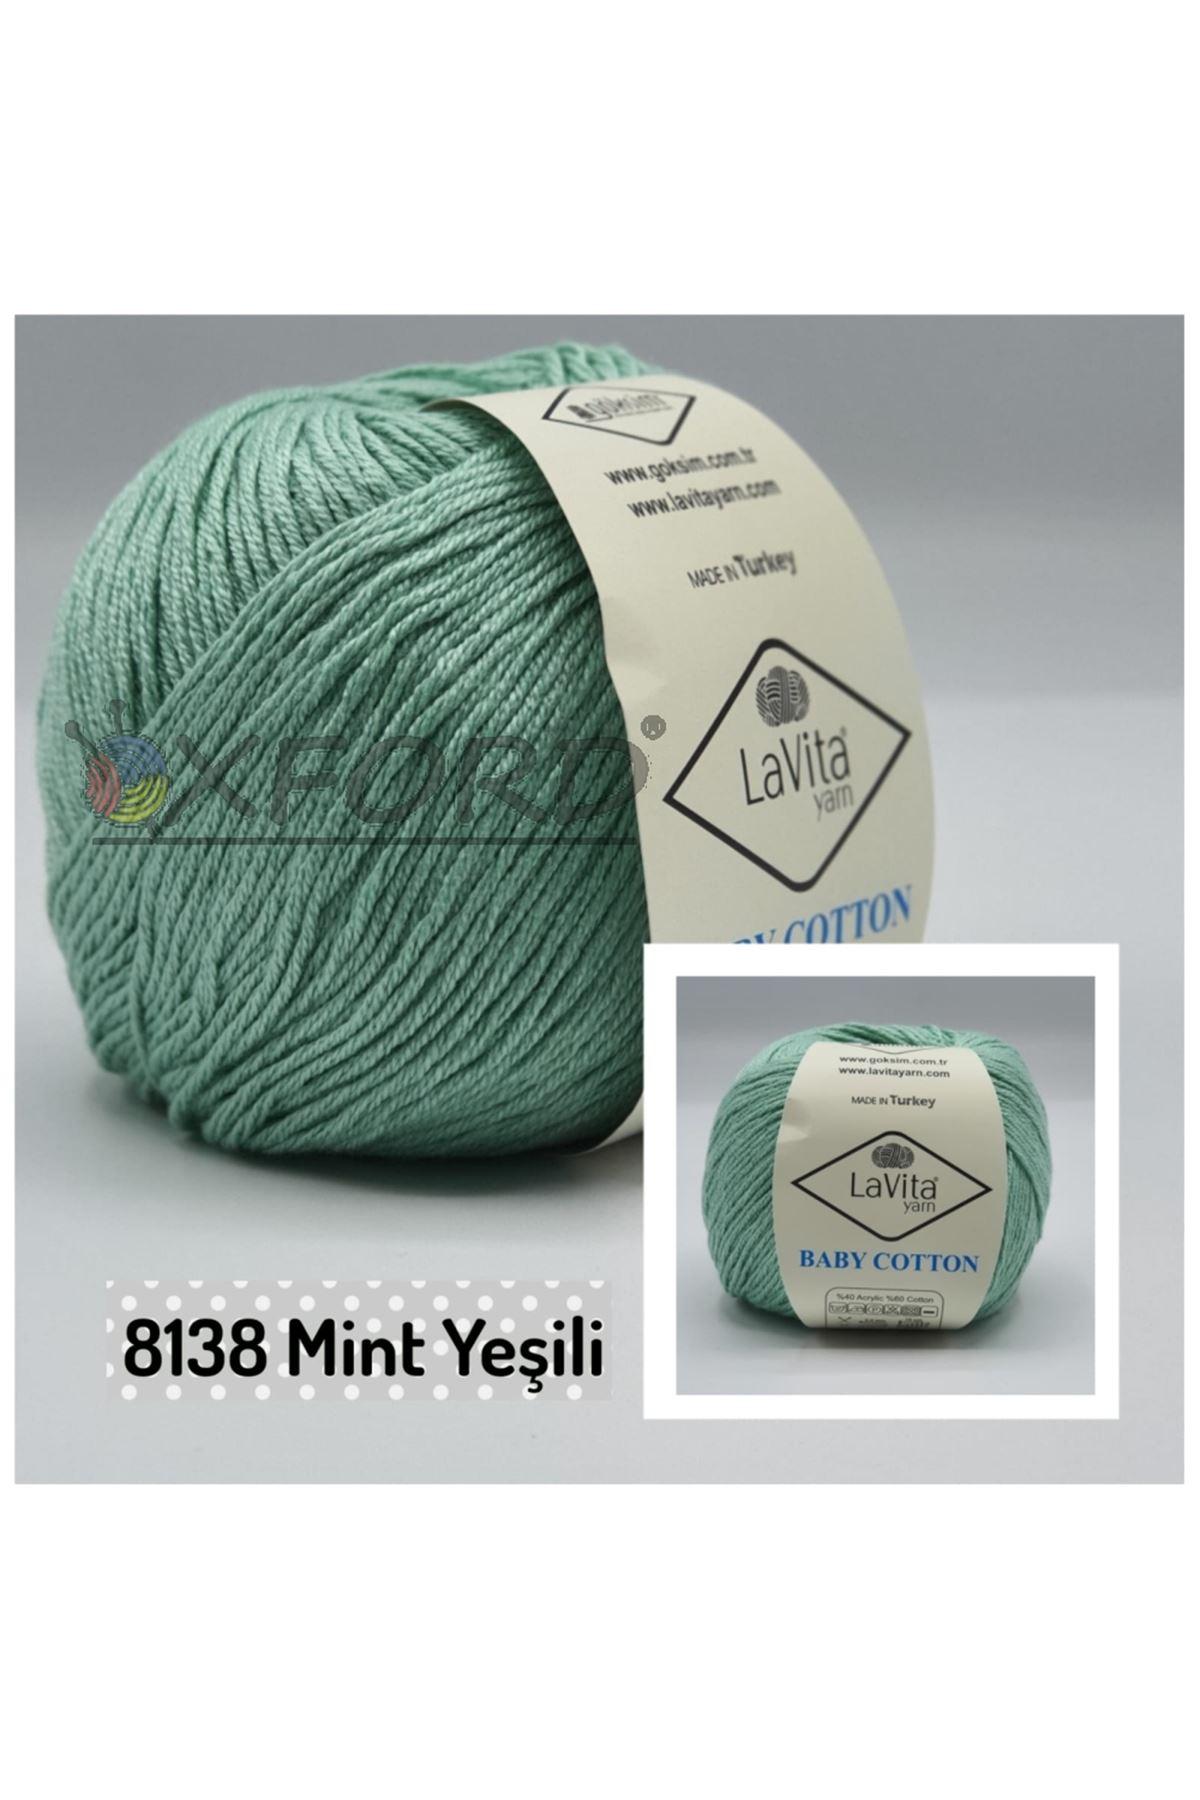 Lavita Baby Cotton 8138 Mint Yeşili